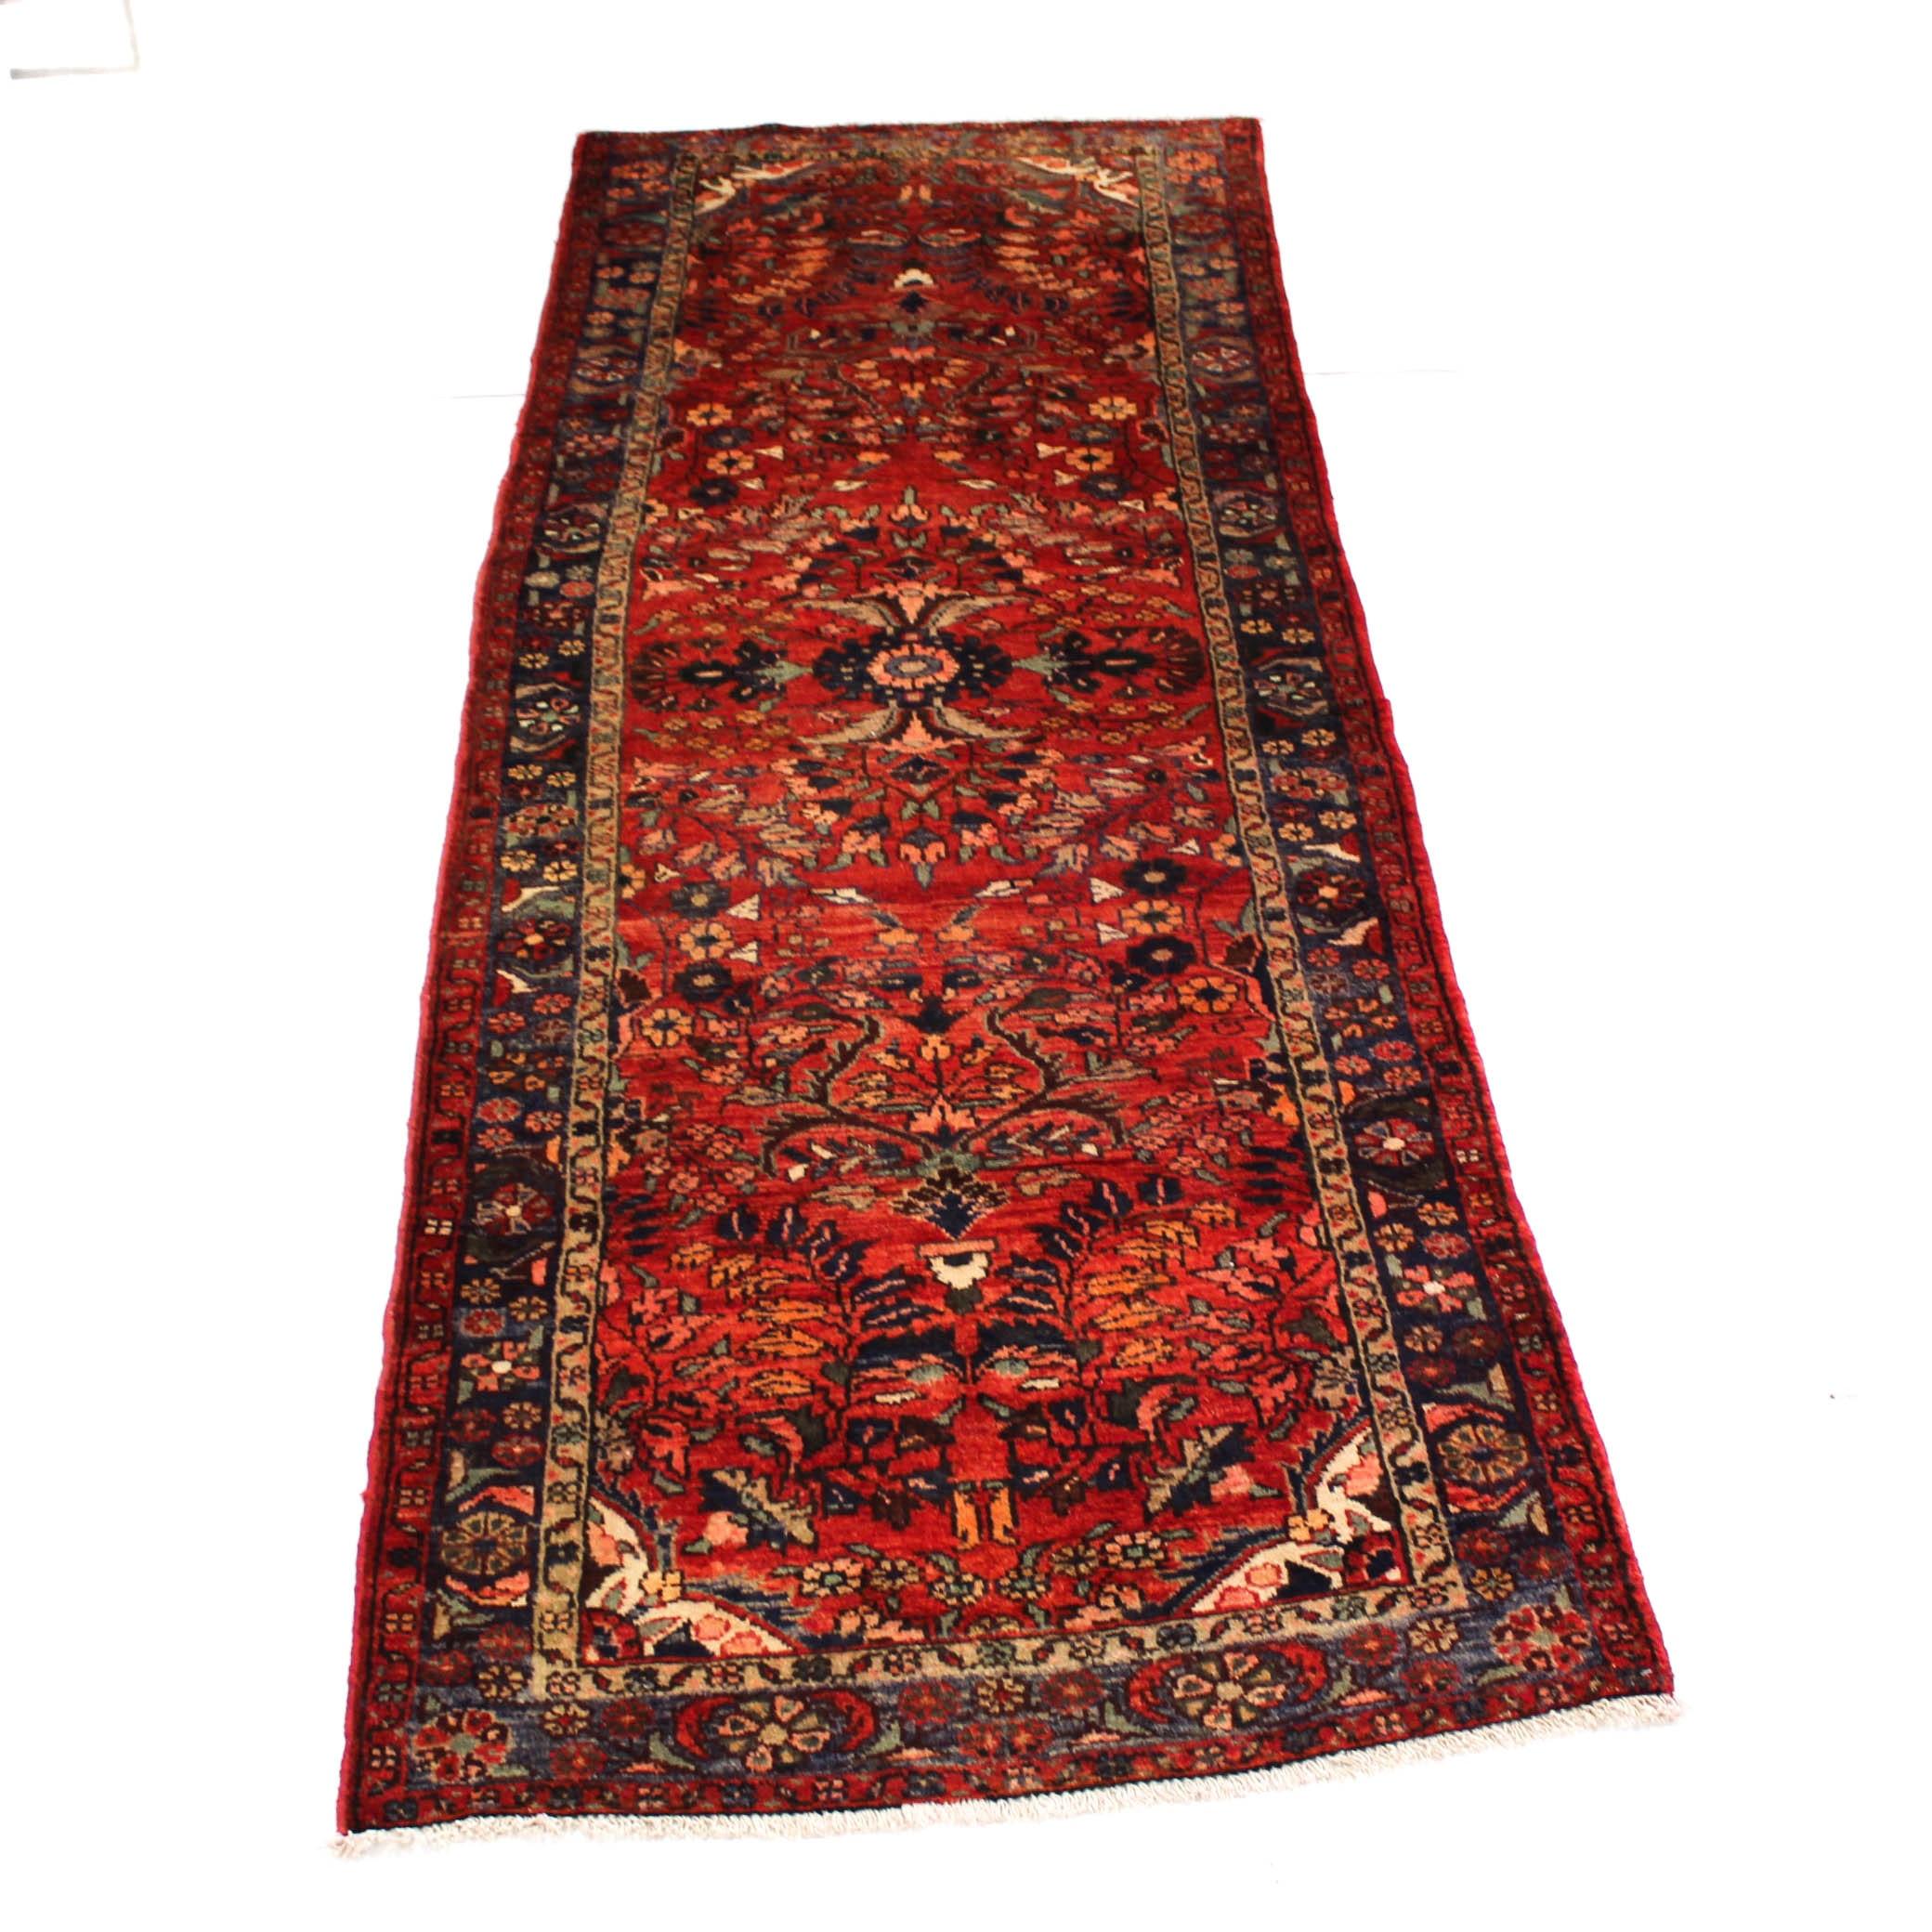 3'6 x 9'9 Semi-Antique Hand-Knotted Persian Lilihan Carpet Runner